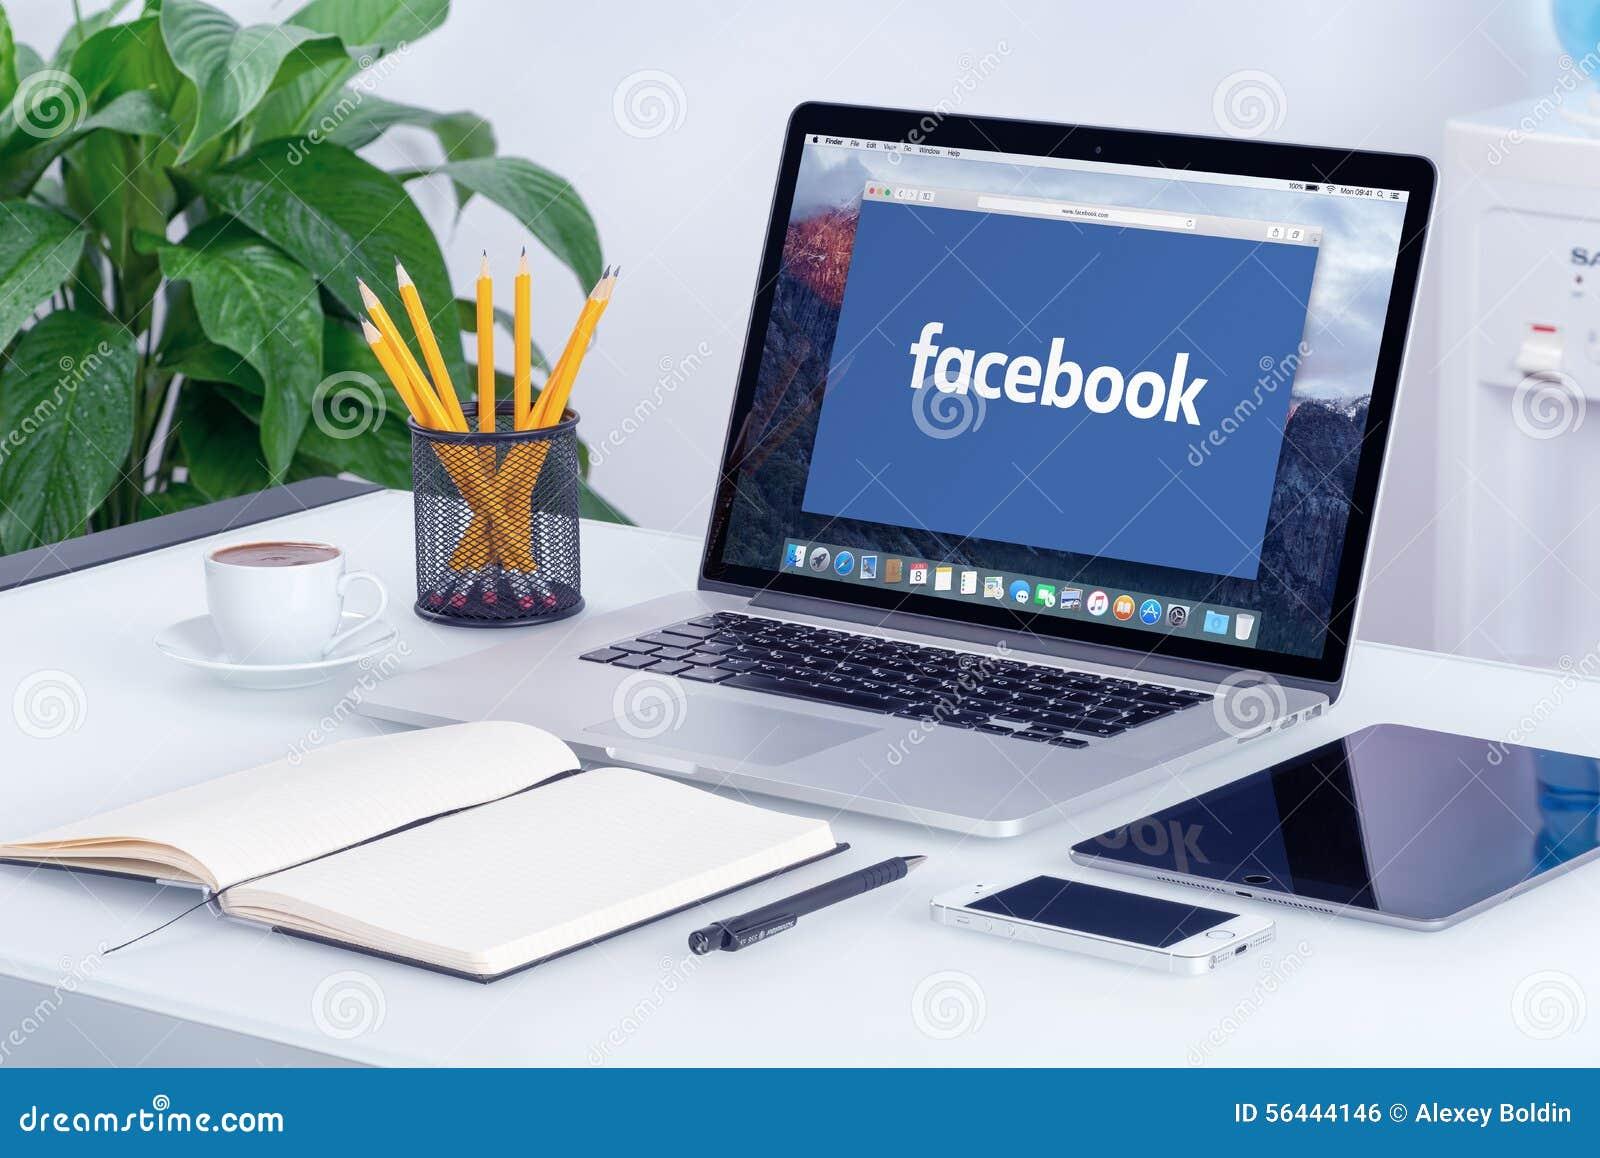 Facebook New Logo On The Apple Macbook Pro Screen